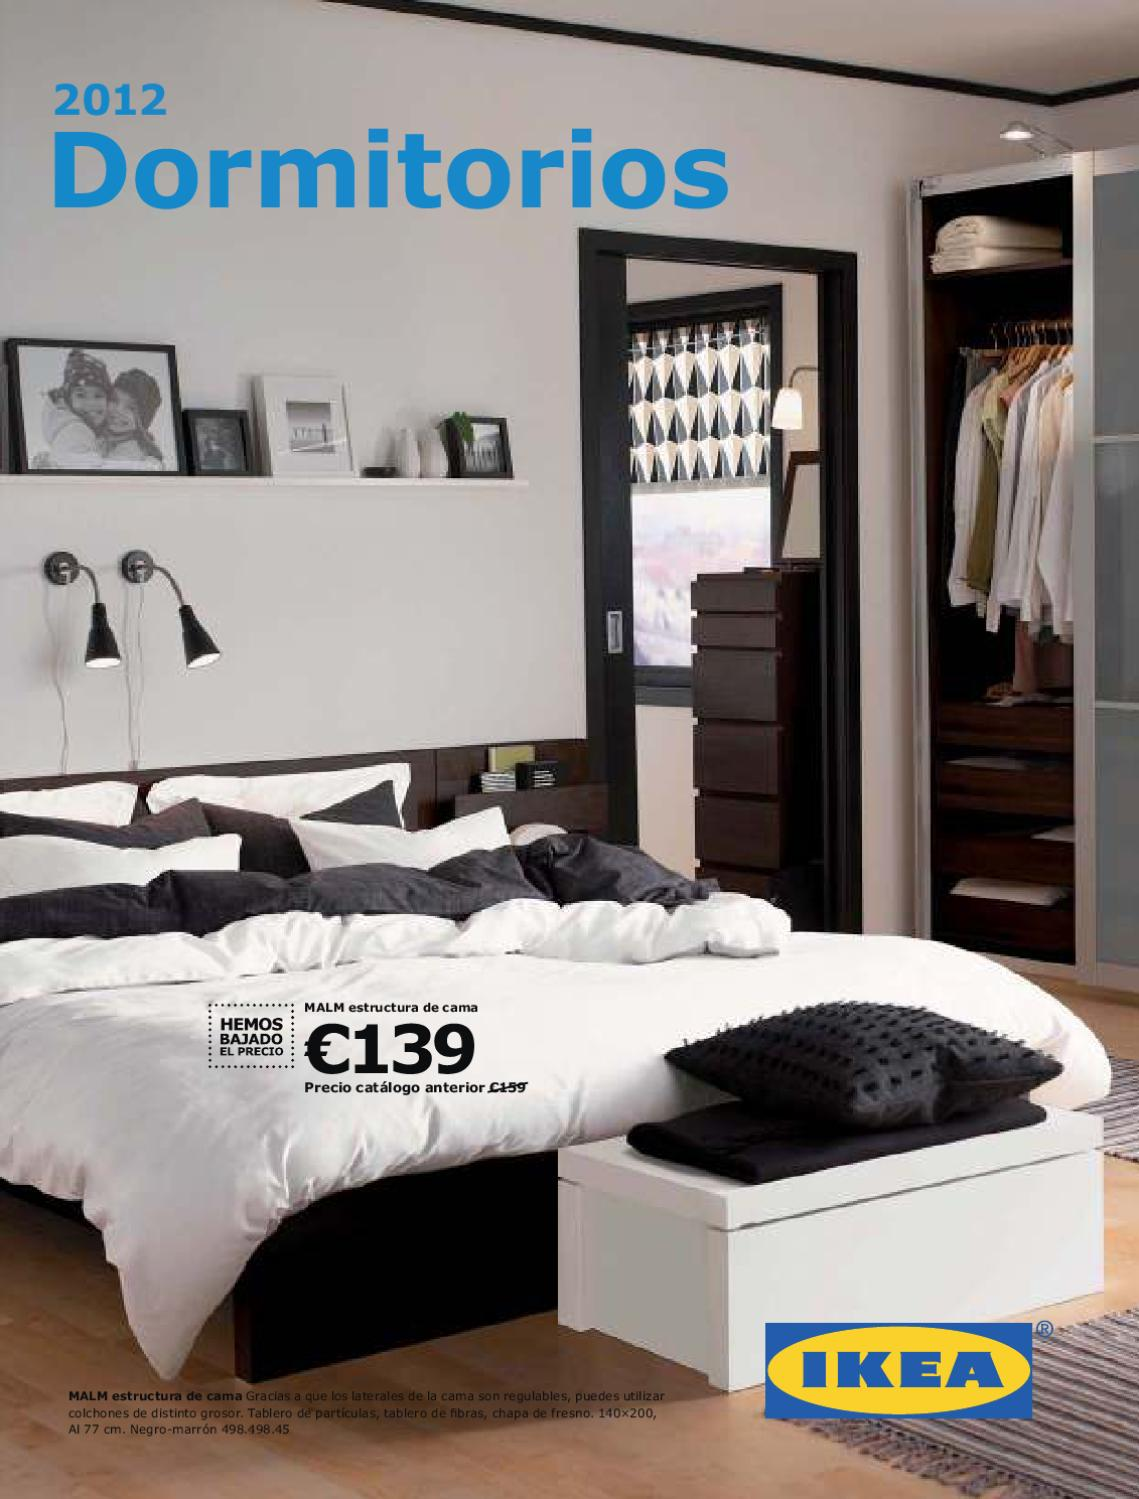 Ikea catálogo dormitorios 2014 by supercatalogos.es   issuu